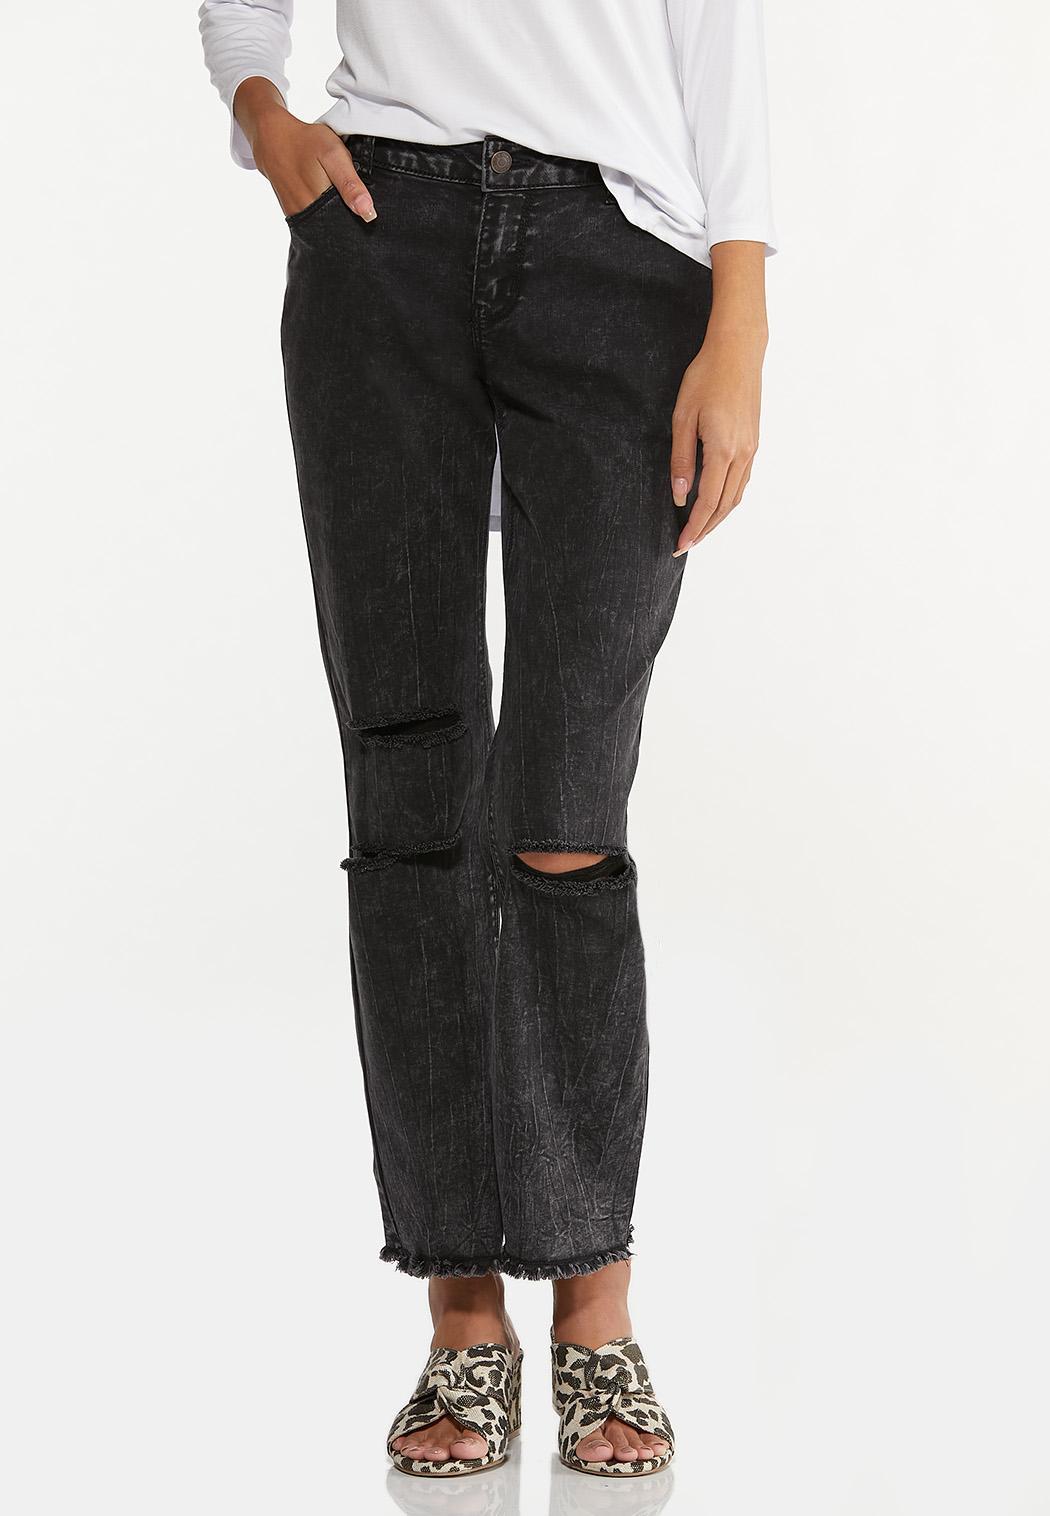 Distressed Black Acid Wash Jeans